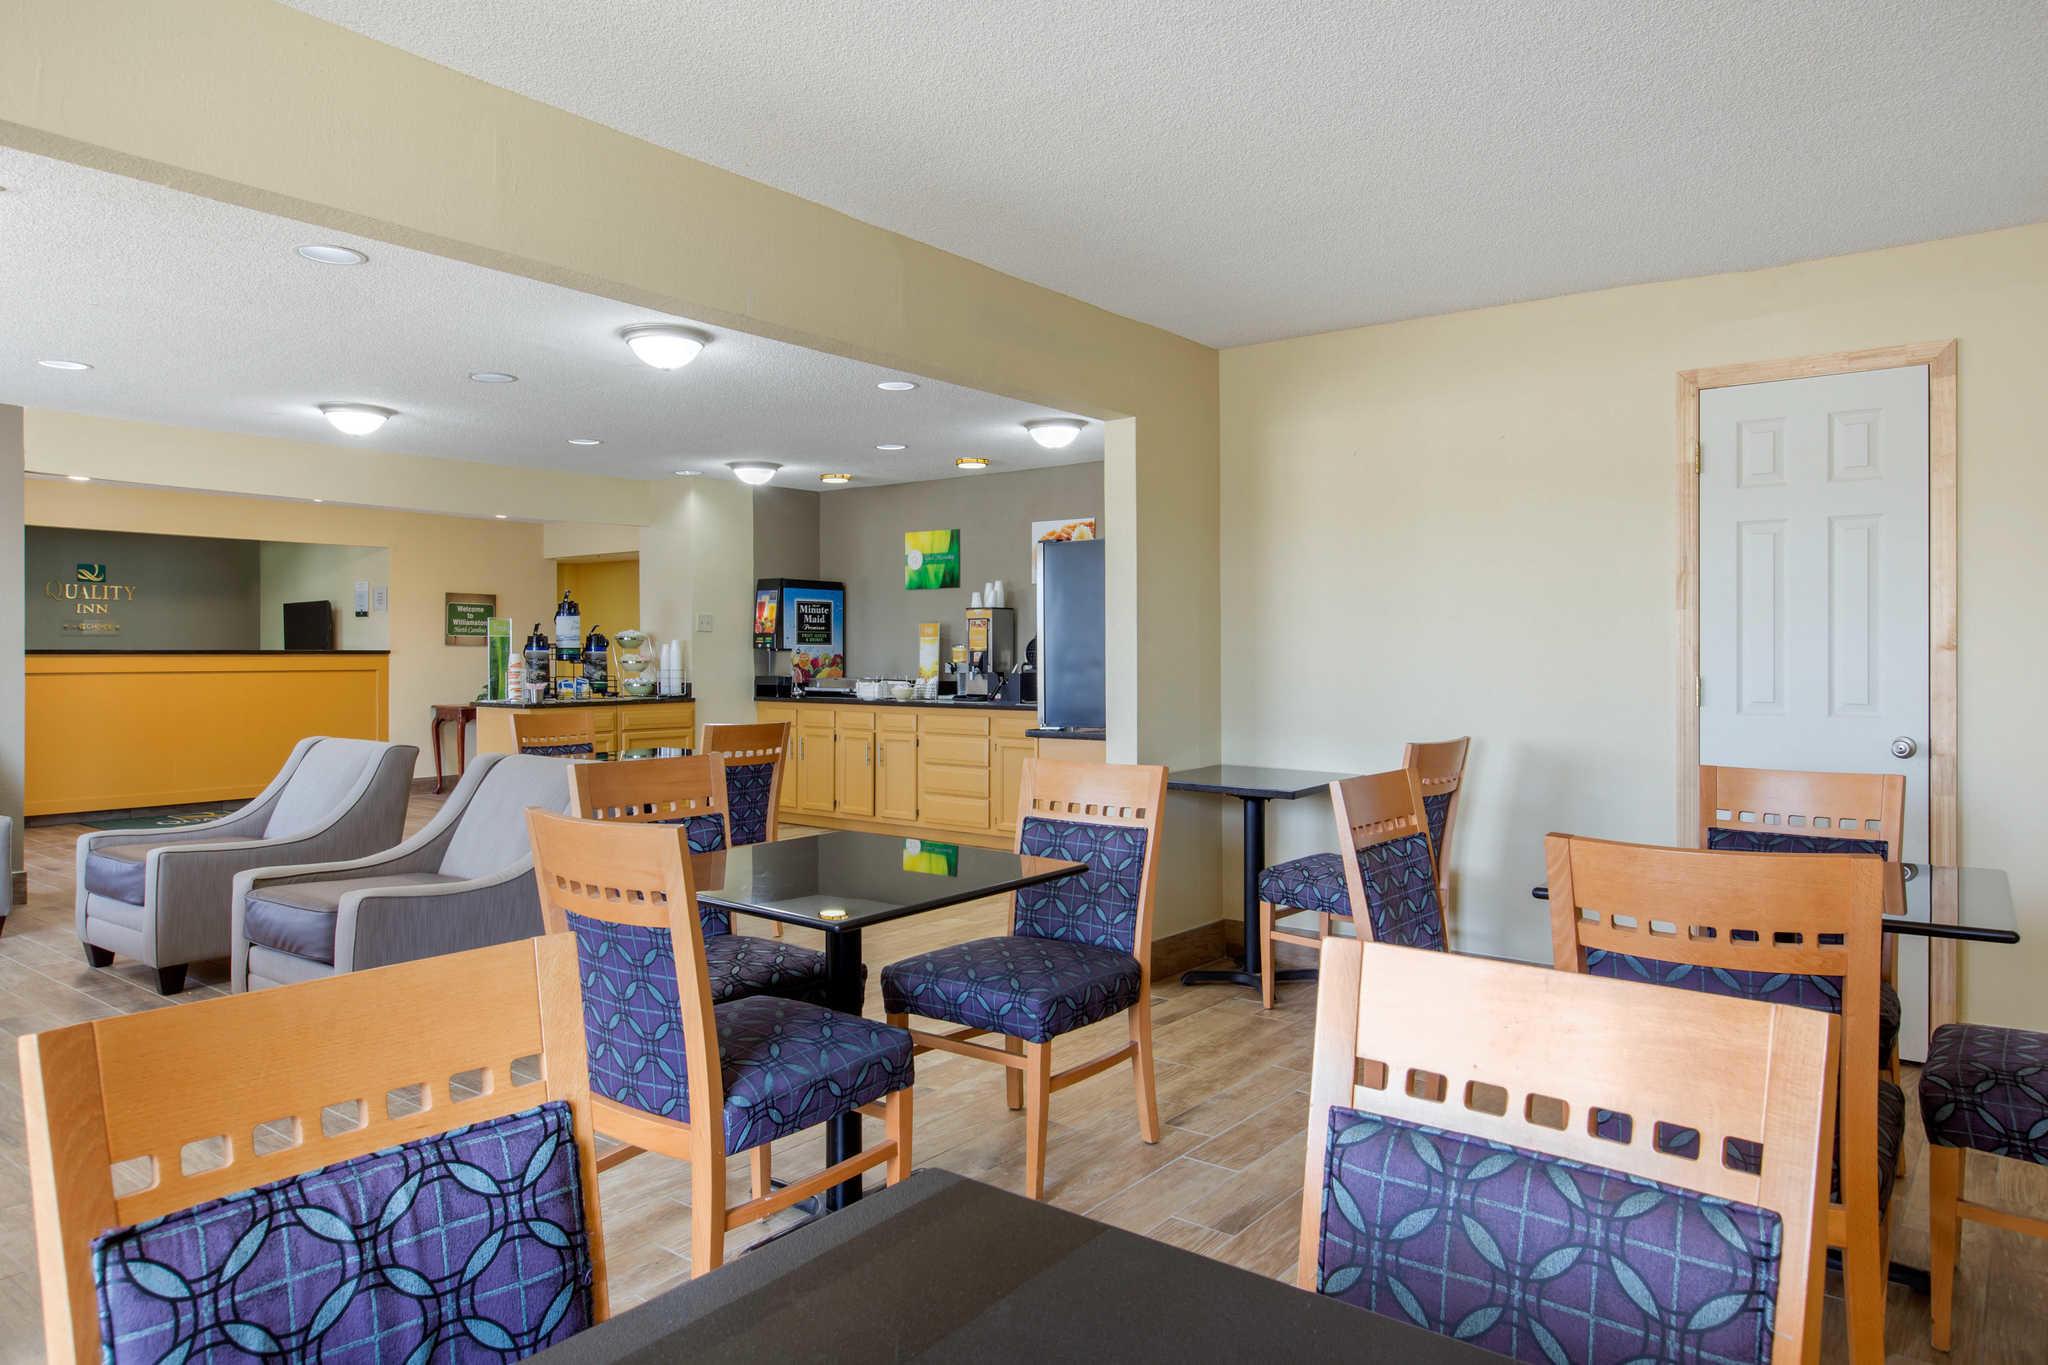 Quality Inn image 35